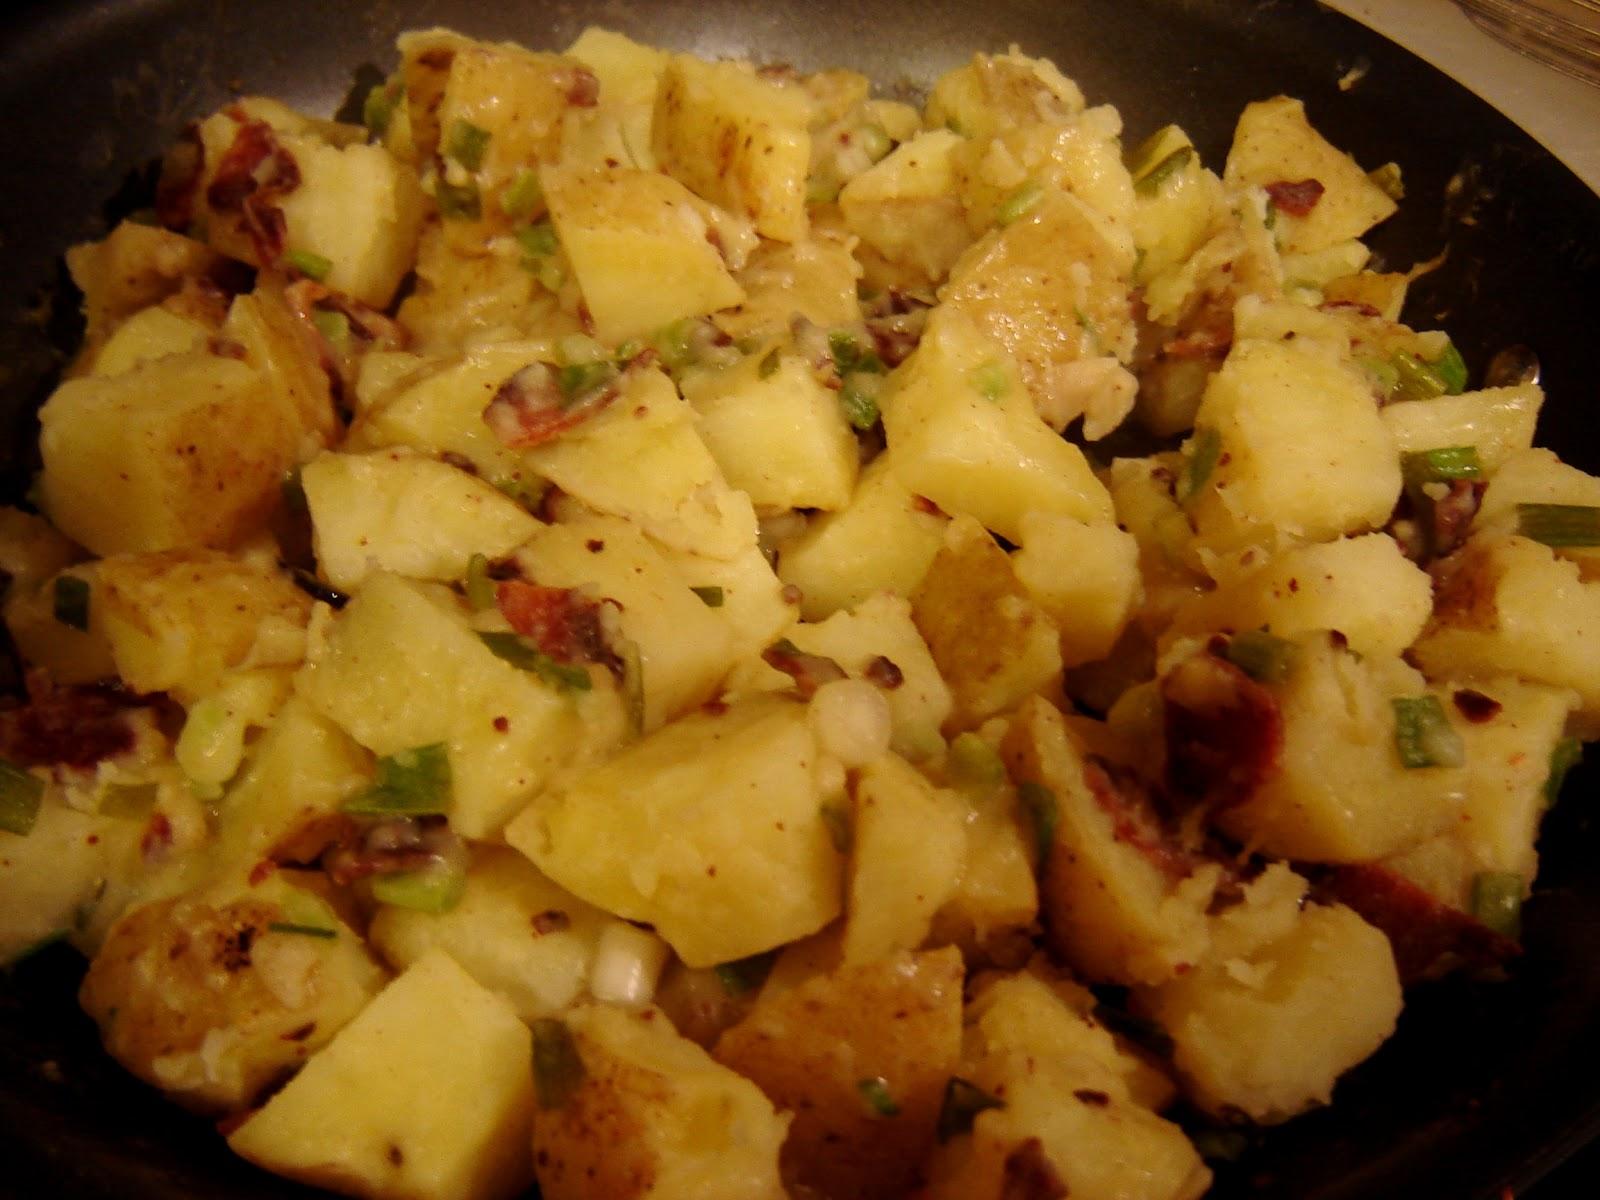 Dinner is Vegan: Warm German Potato Salad